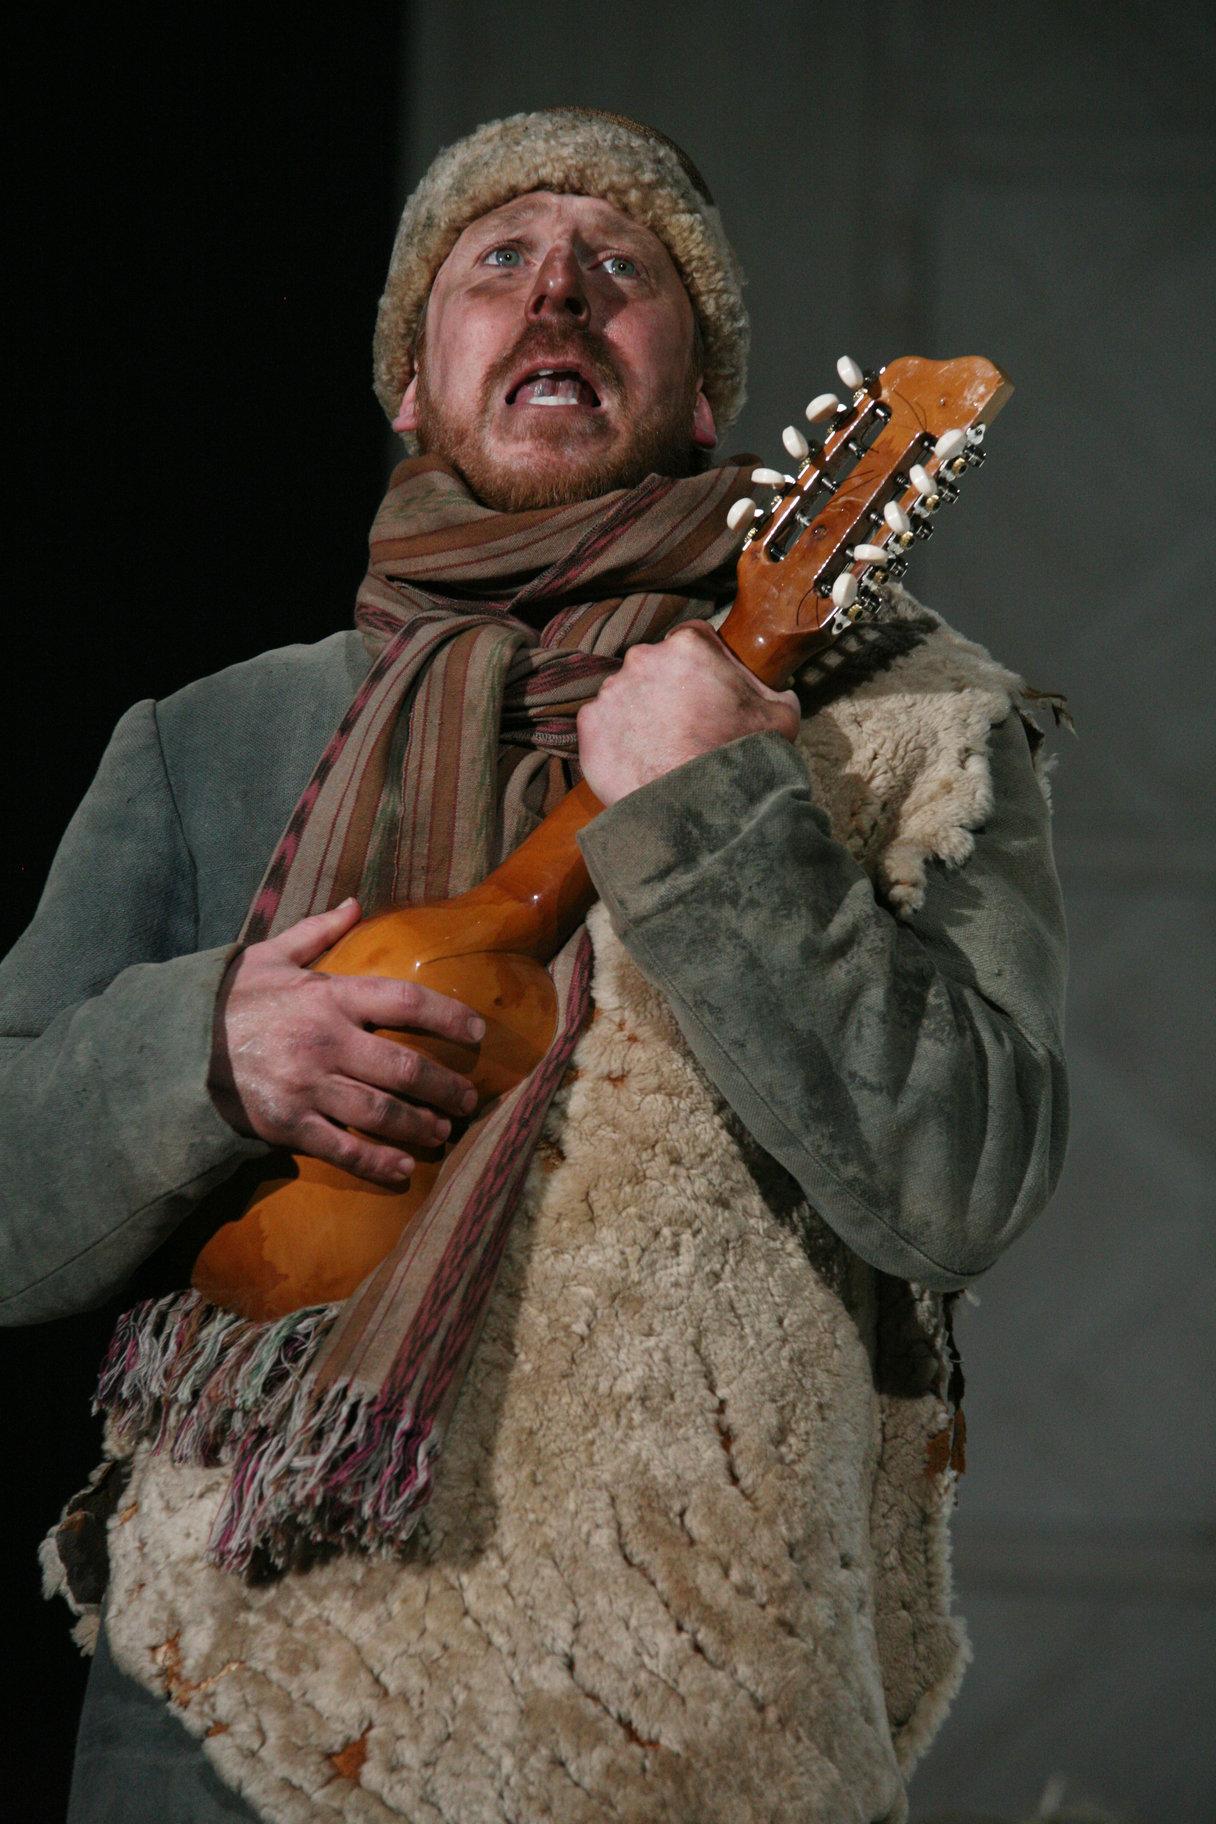 A scruffy man with a ukulele.